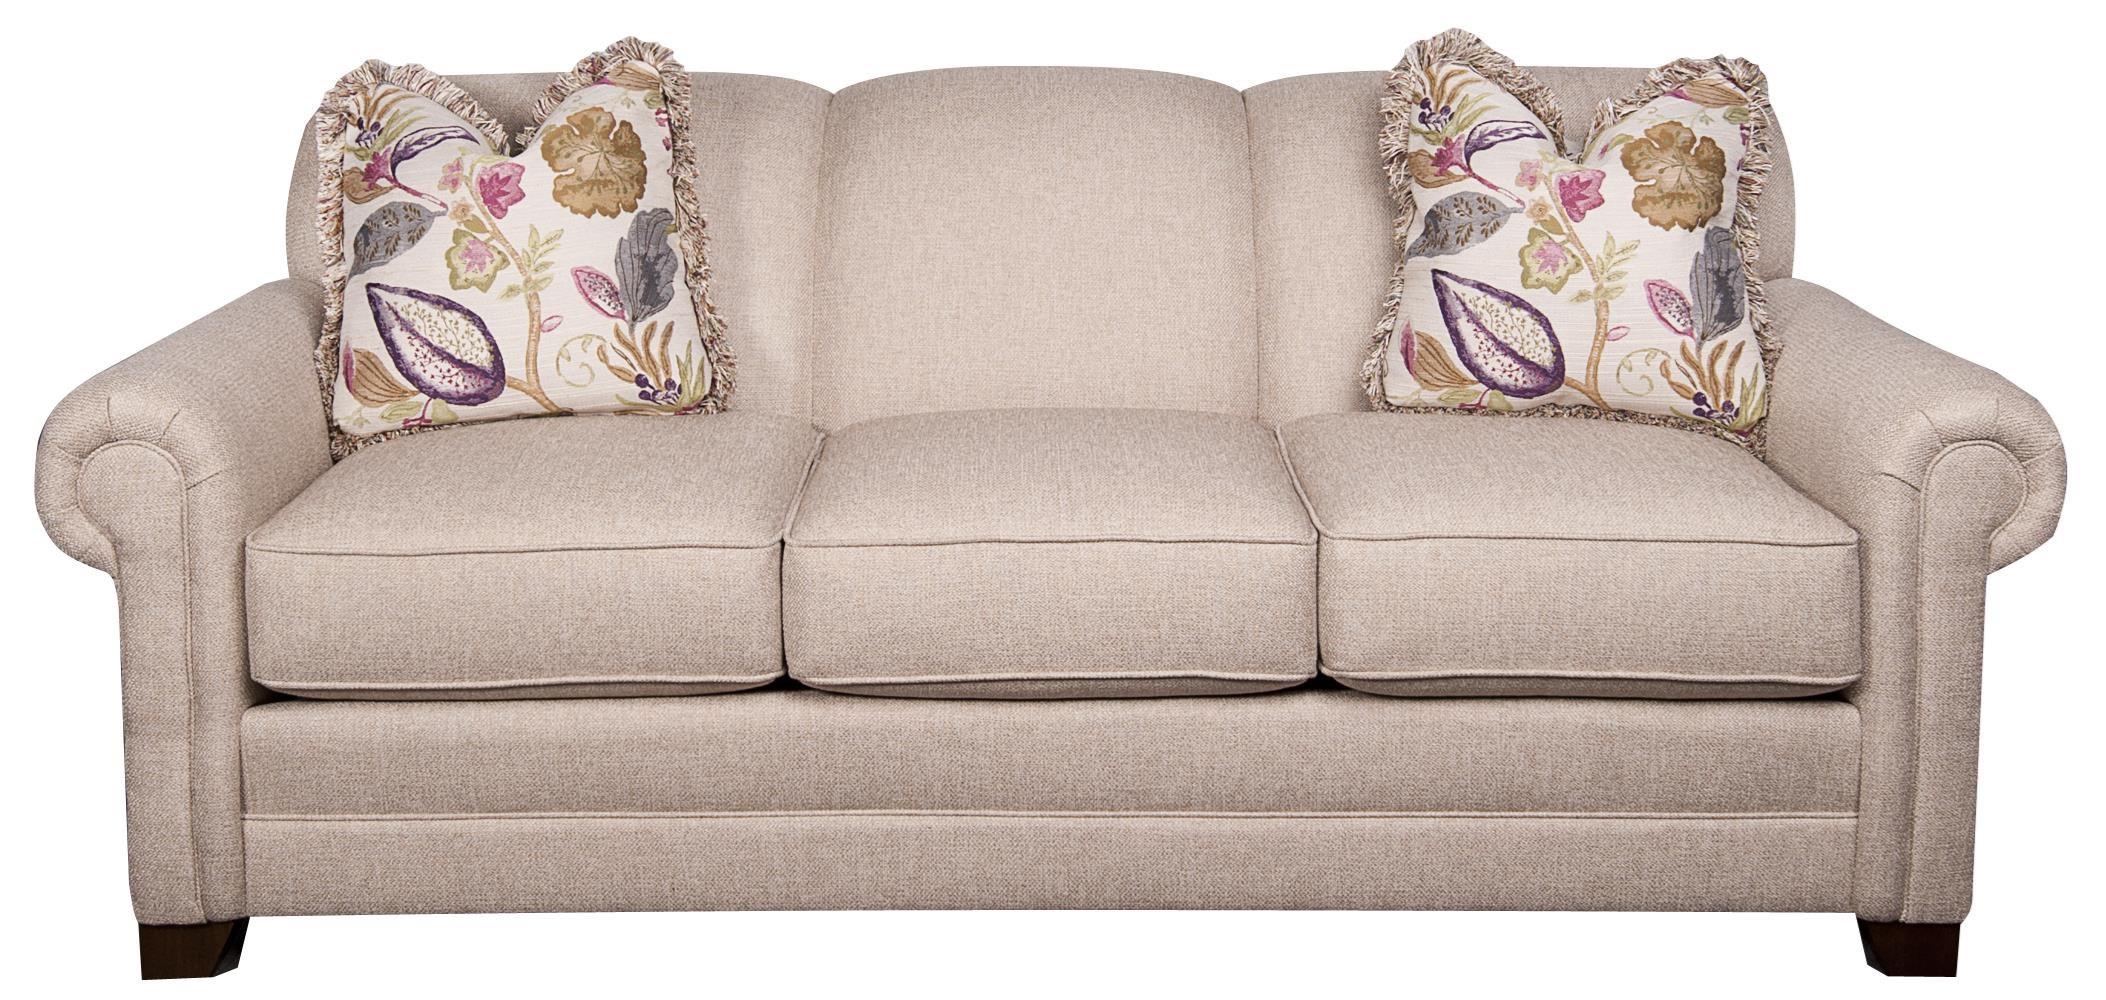 Morris Home Furnishings Carmela Carmela Sofa - Item Number: 695106787